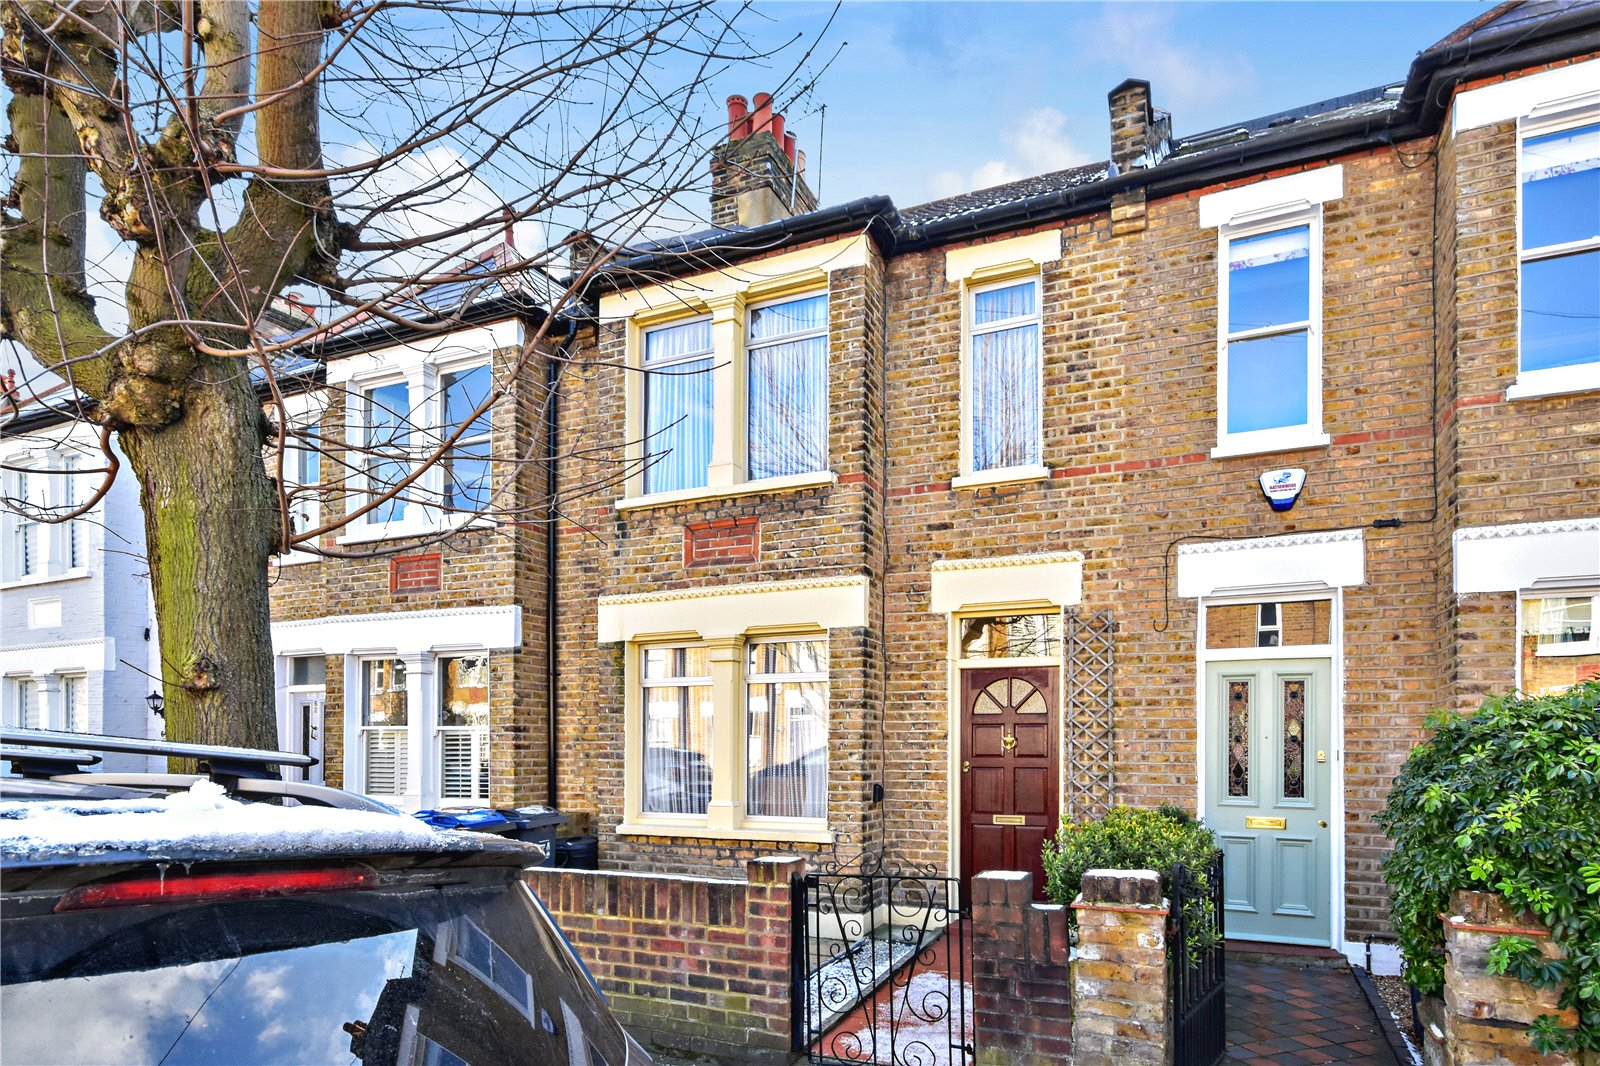 Florence Road, Wimbledon, London, SW19